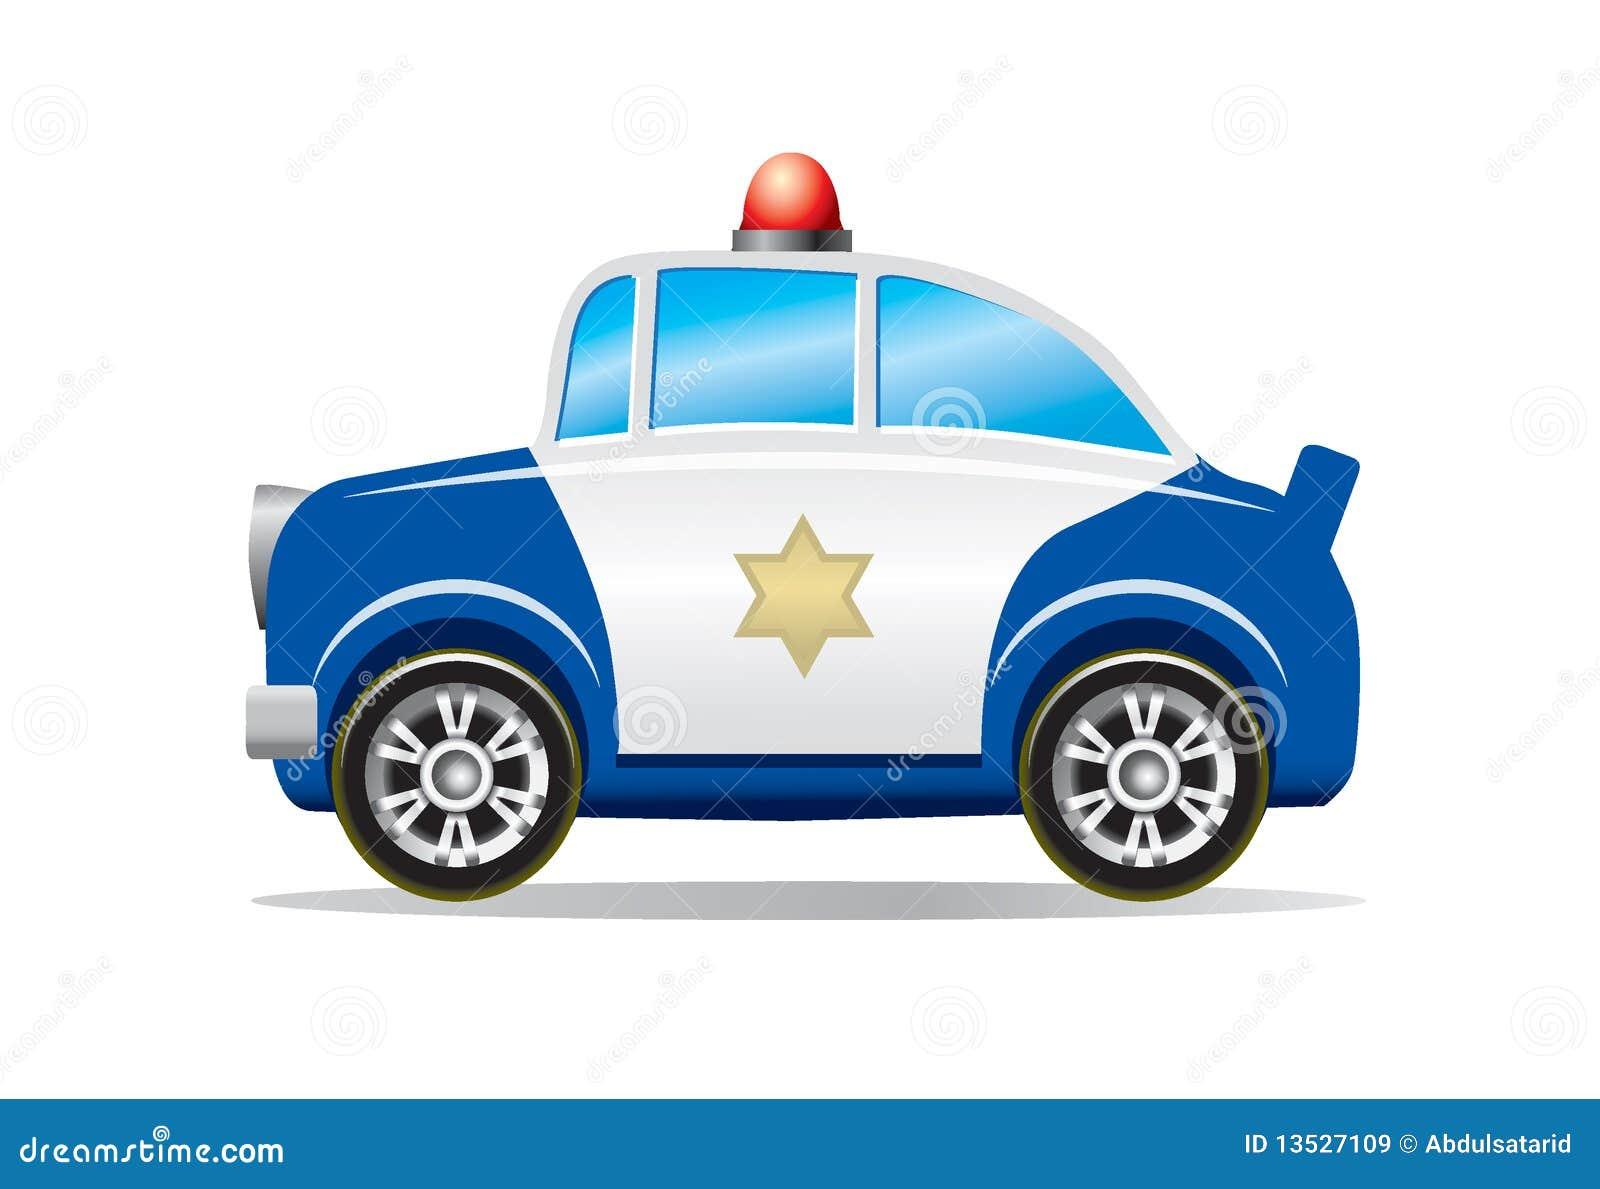 Dessin anim de v hicule de police images libres de droits image 13527109 - Voiture police dessin anime ...